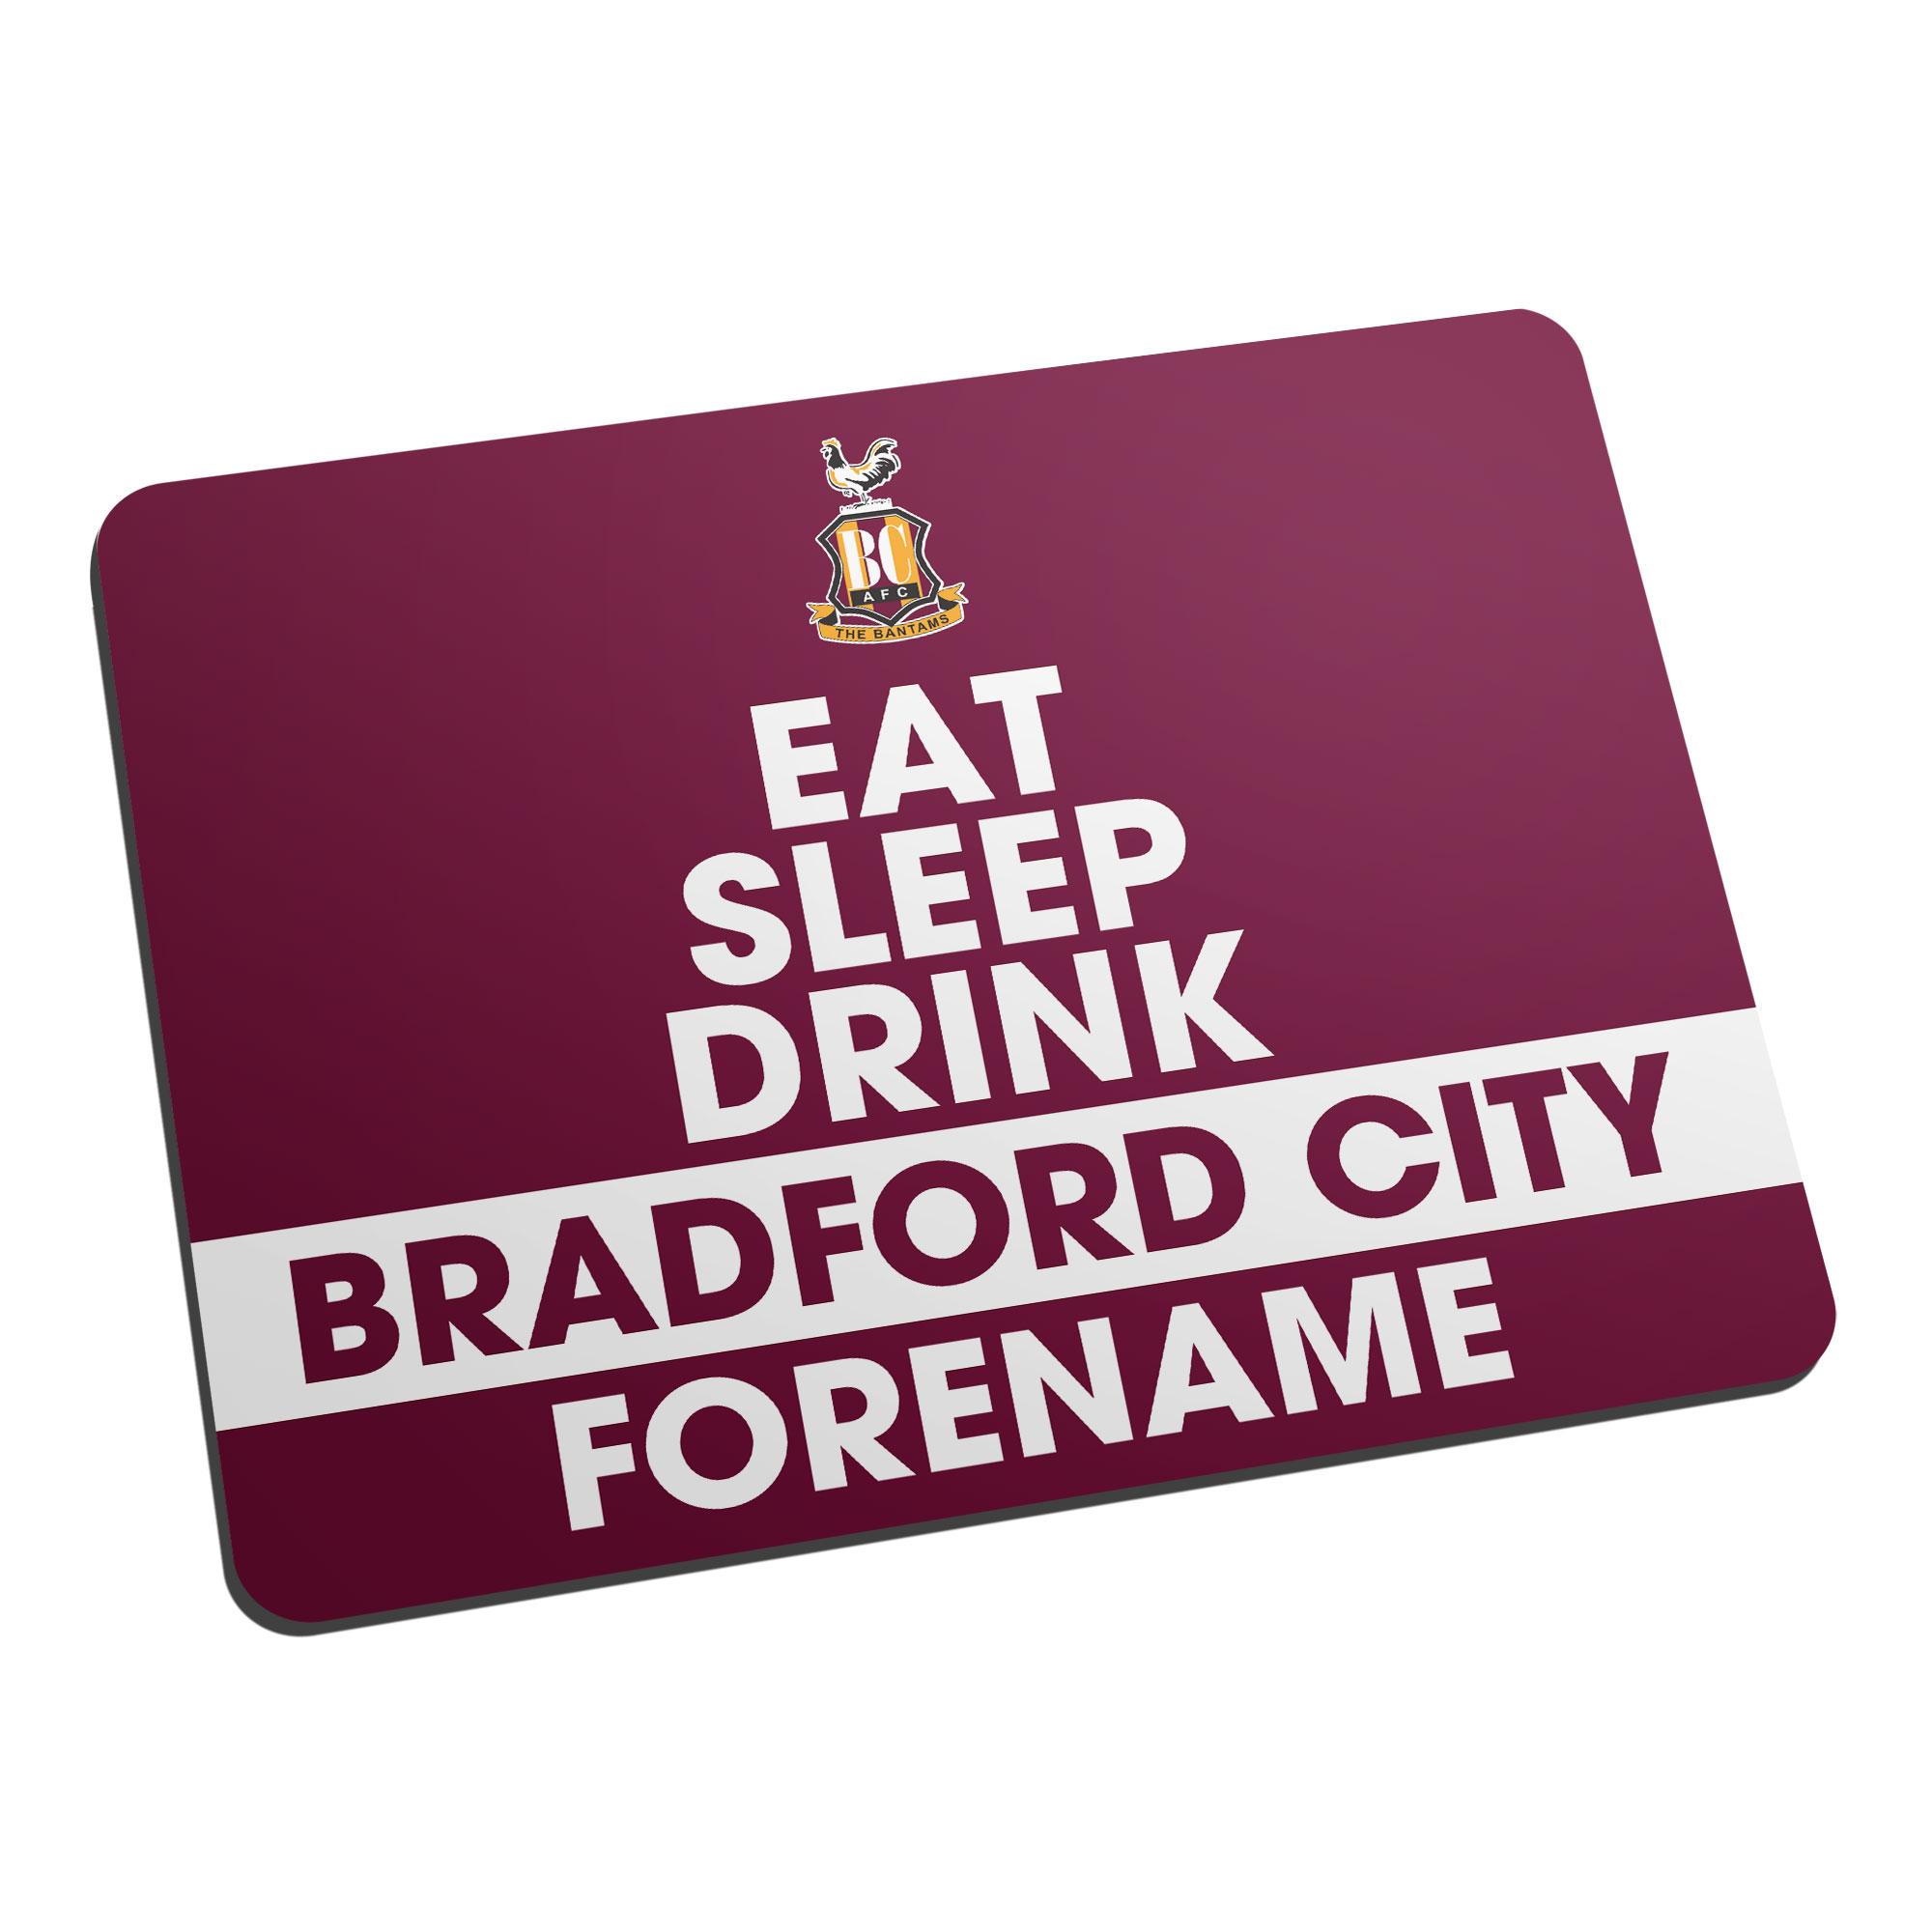 Bradford City AFC Eat Sleep Drink Mouse Mat